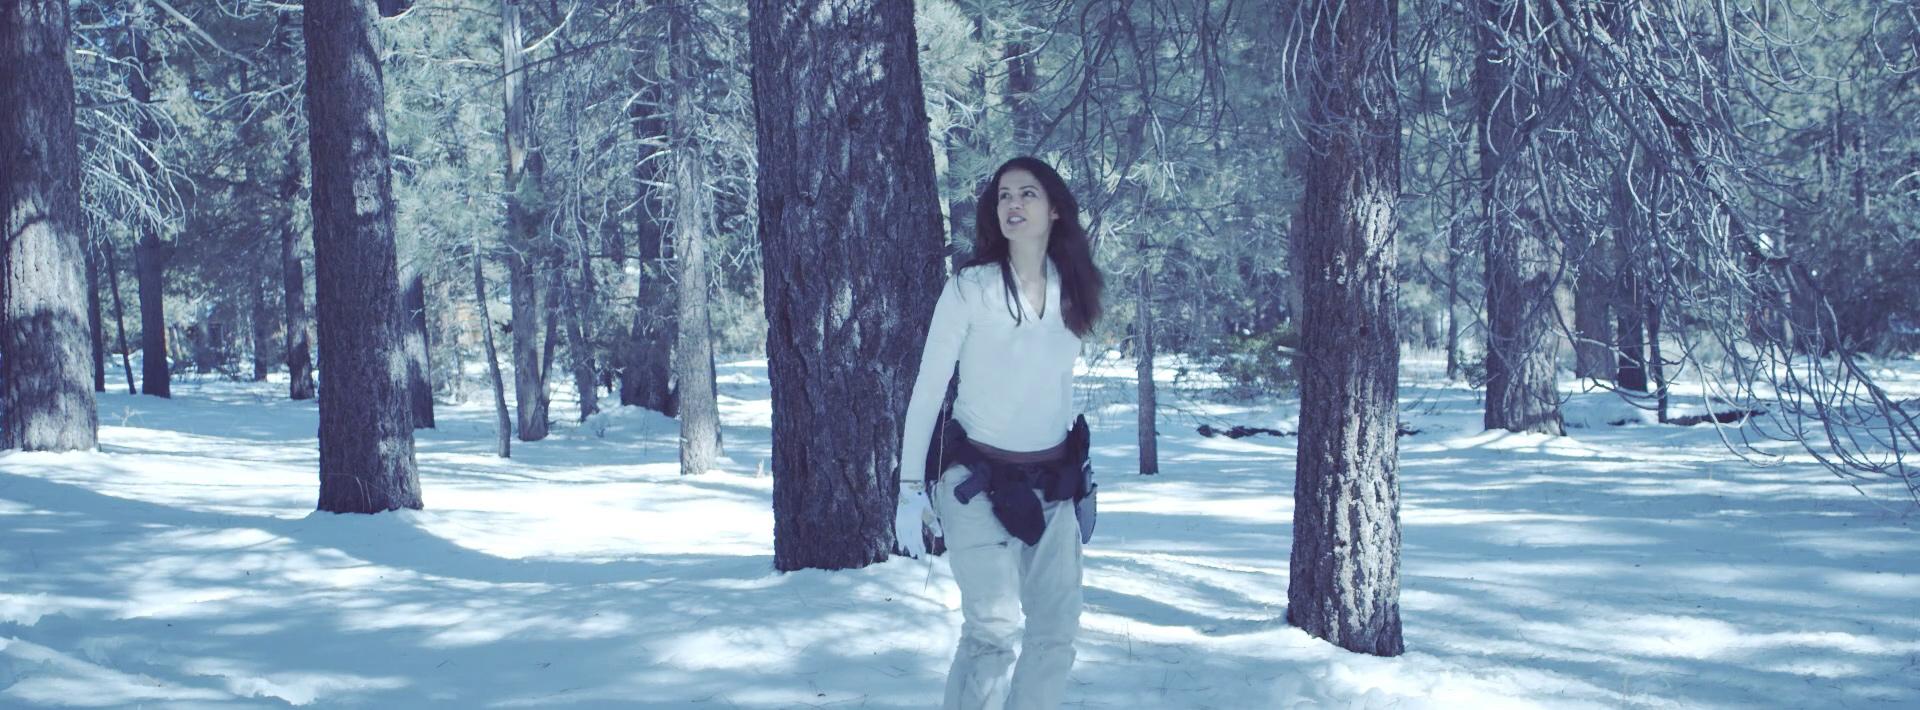 beautifully-shot-sci-fi-short-film-beyond-25.jpg